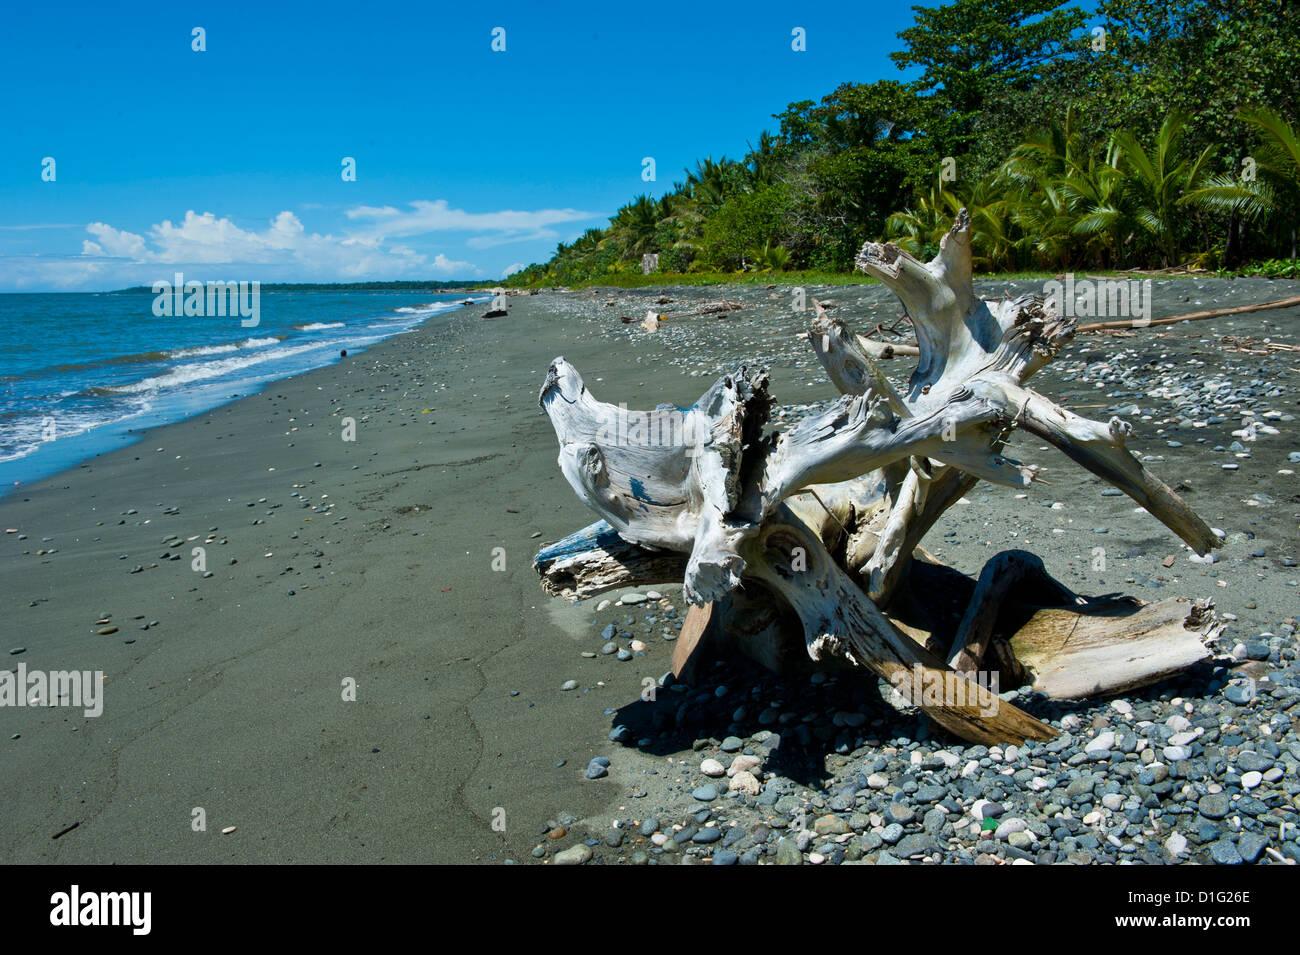 Beach at Savo Island, Savo, Solomon Islands, Pacific - Stock Image